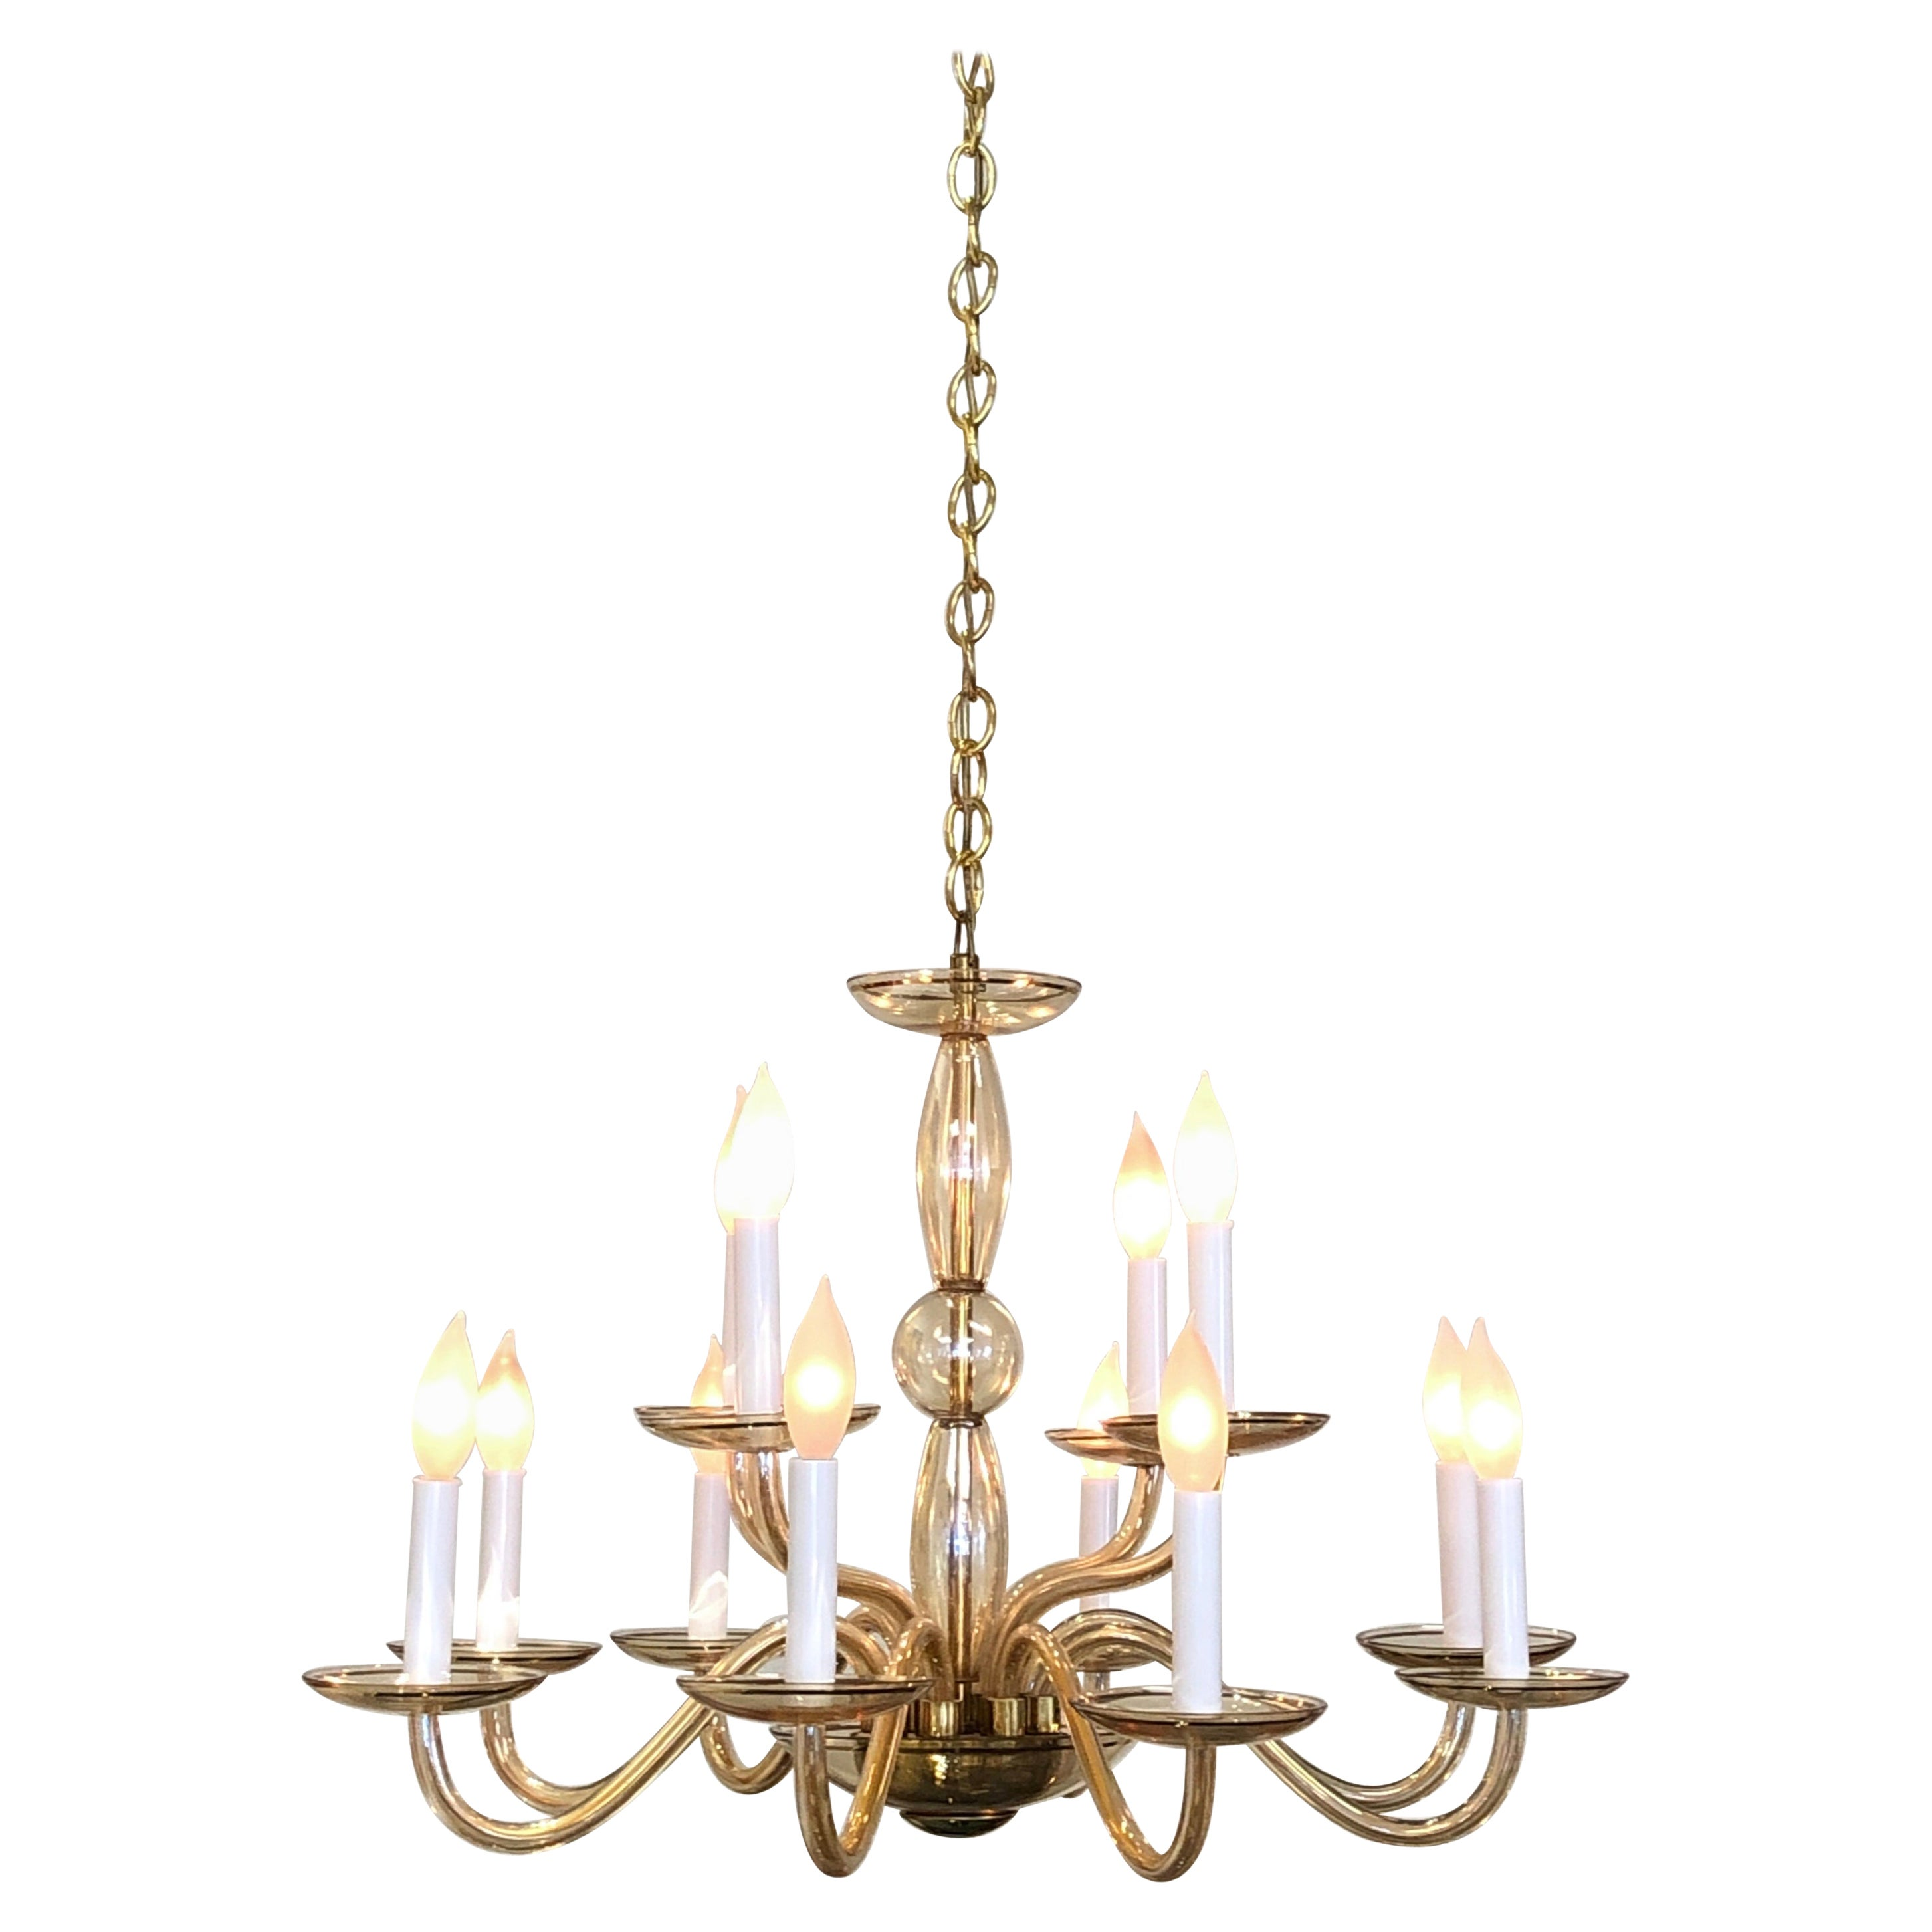 Italian Amber Murano Glass and Brass Chandelier